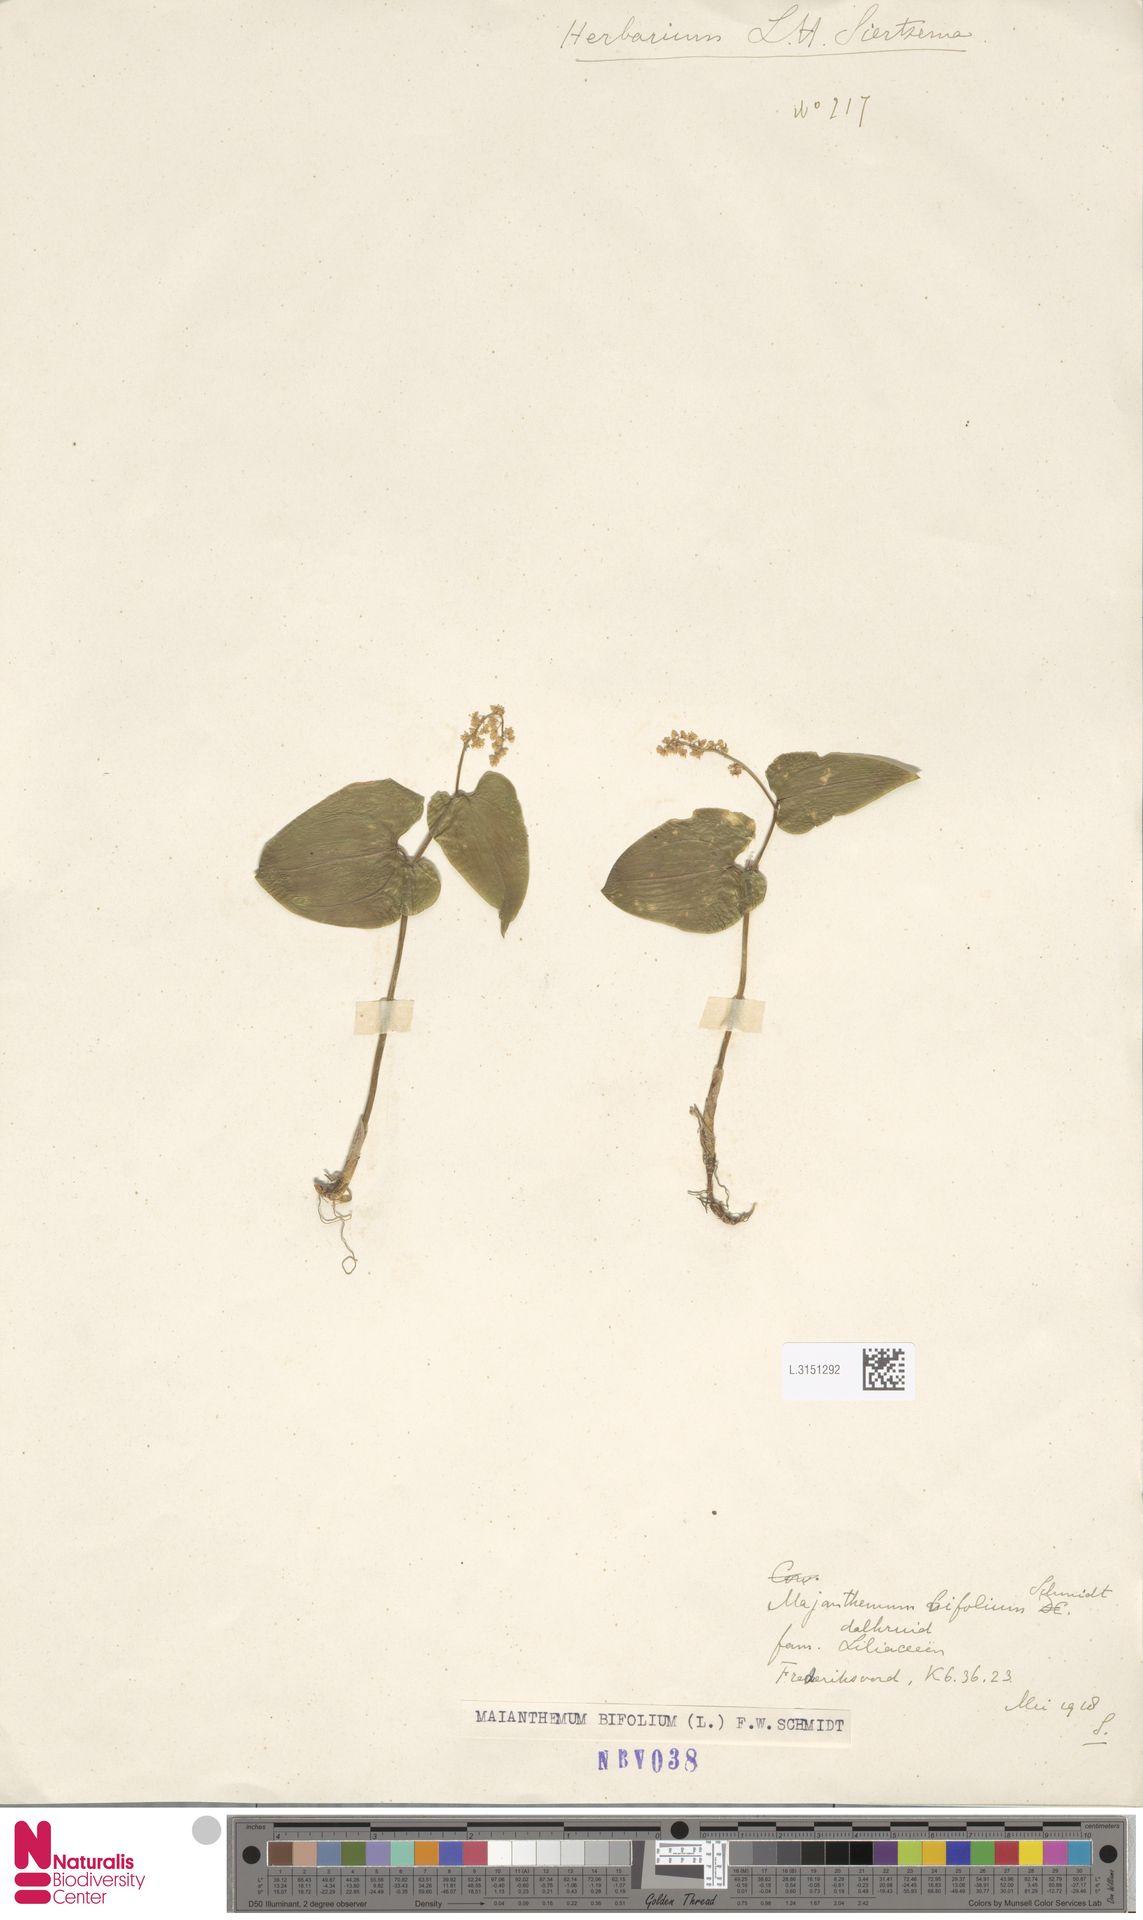 L.3151292 | Maianthemum bifolium (L.) F.W.Schmidt